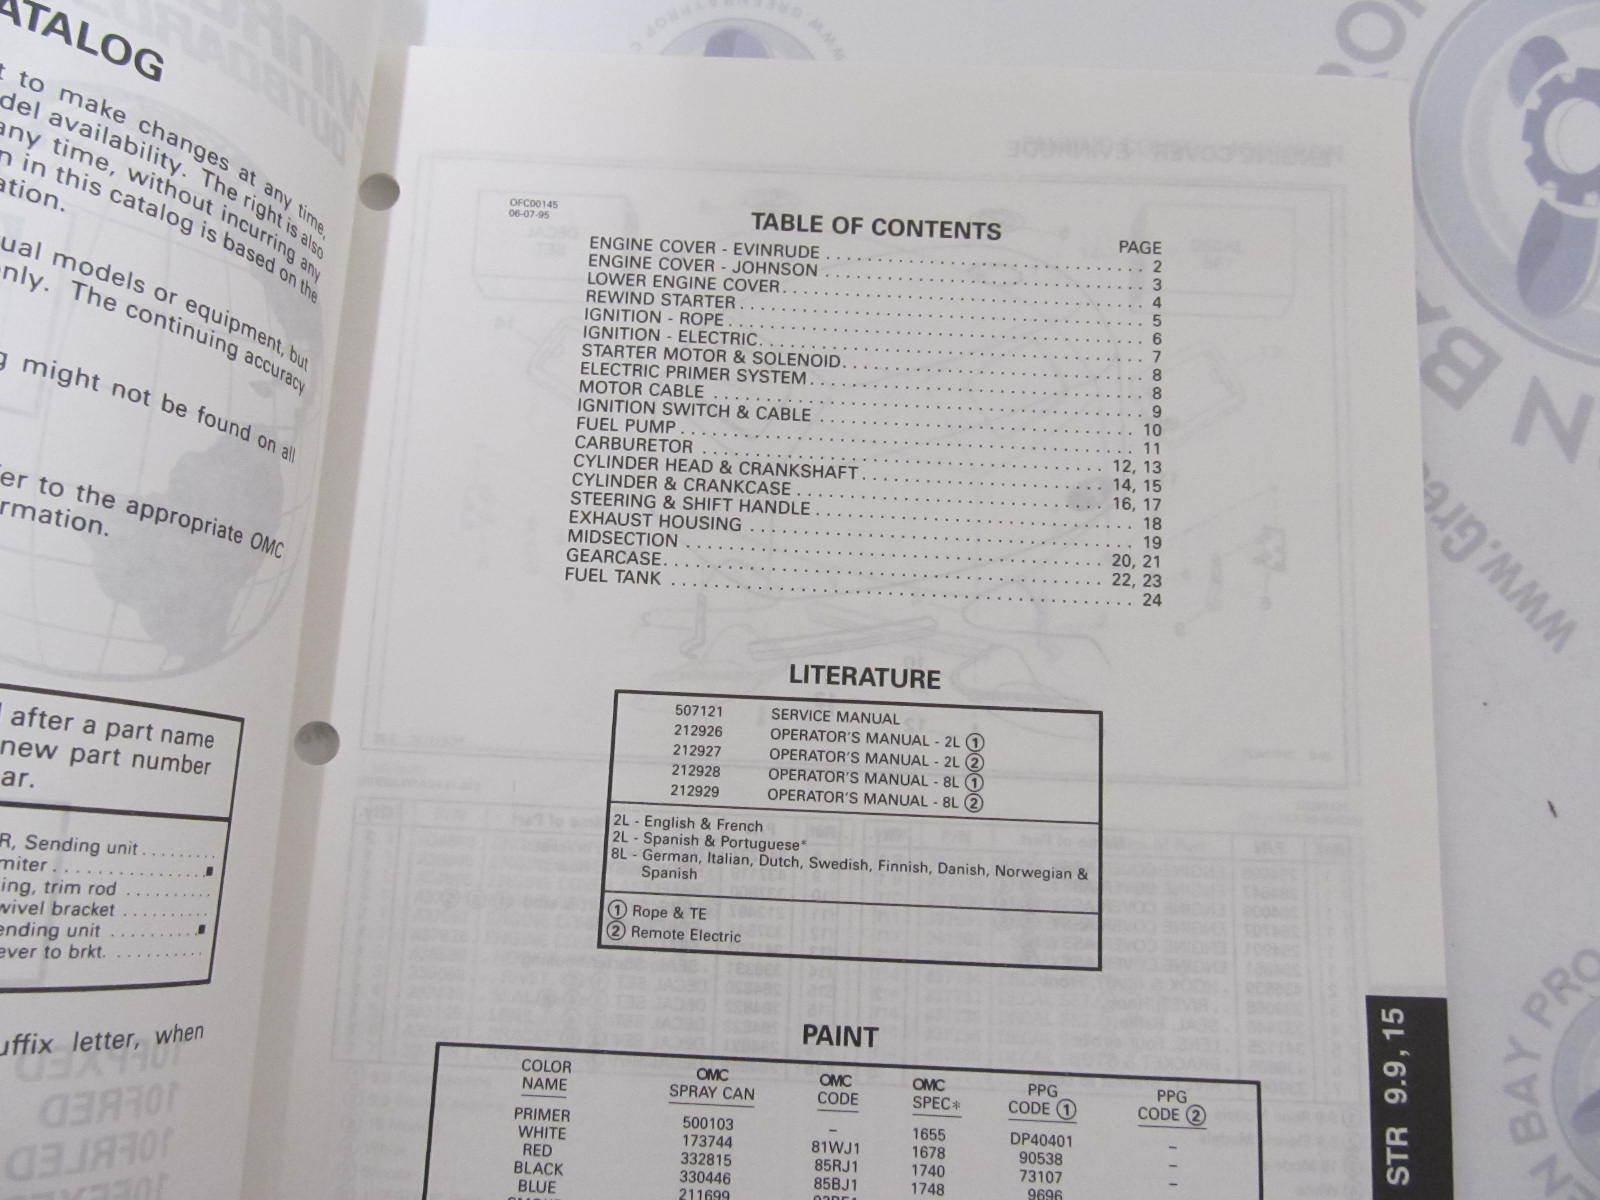 438149 OMC Evinrude Johnson 9 9-15 HP 4-Stroke Outboard Parts Catalog 1996